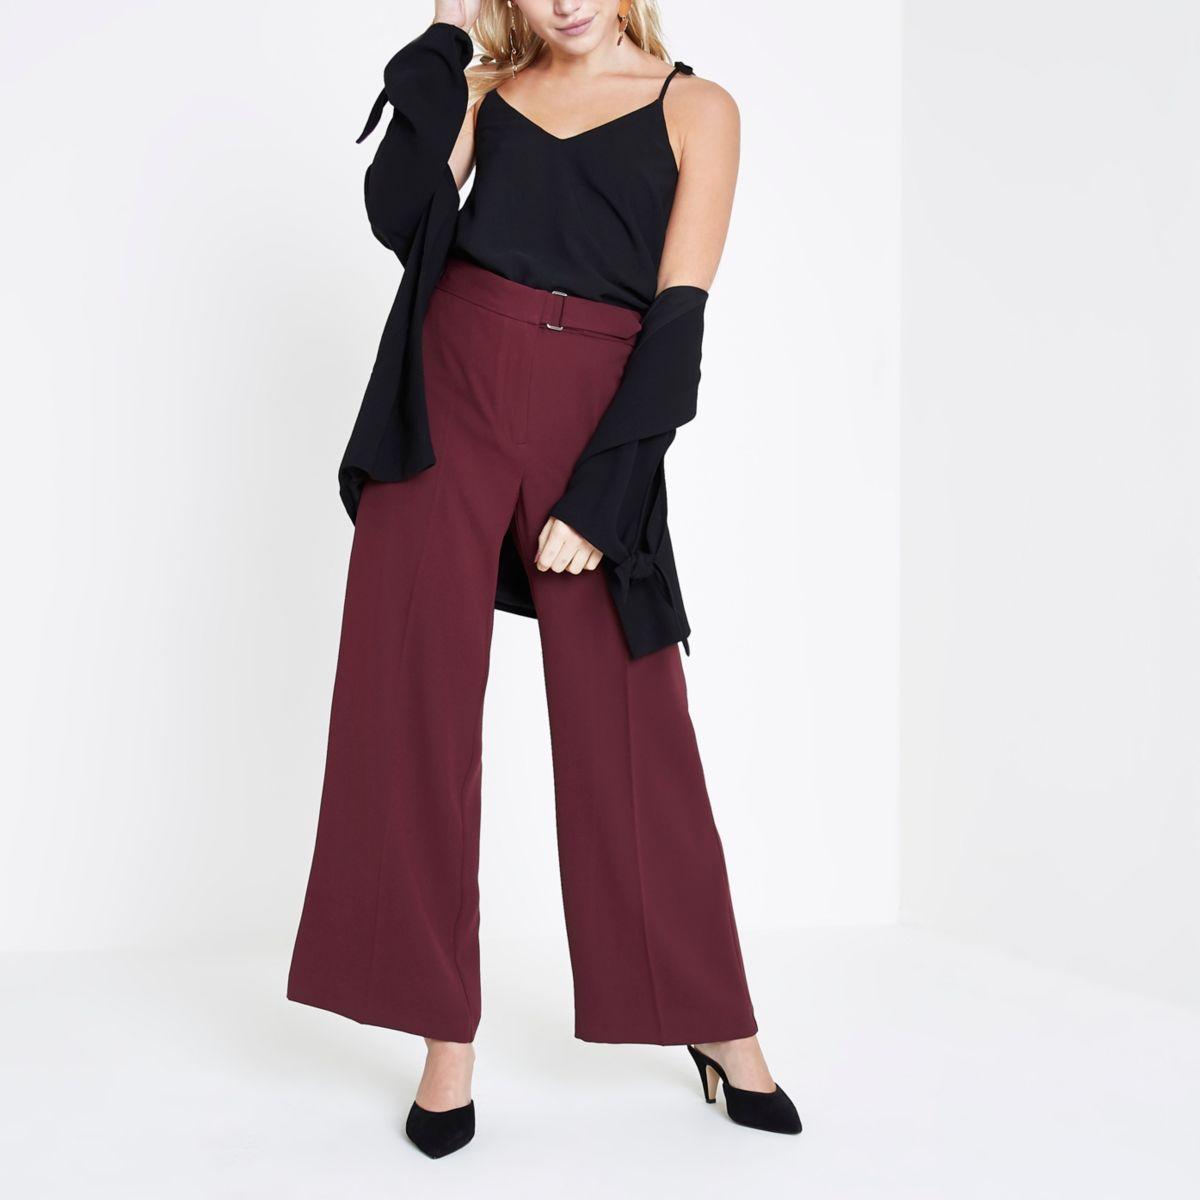 Petite burgundy wide leg trousers